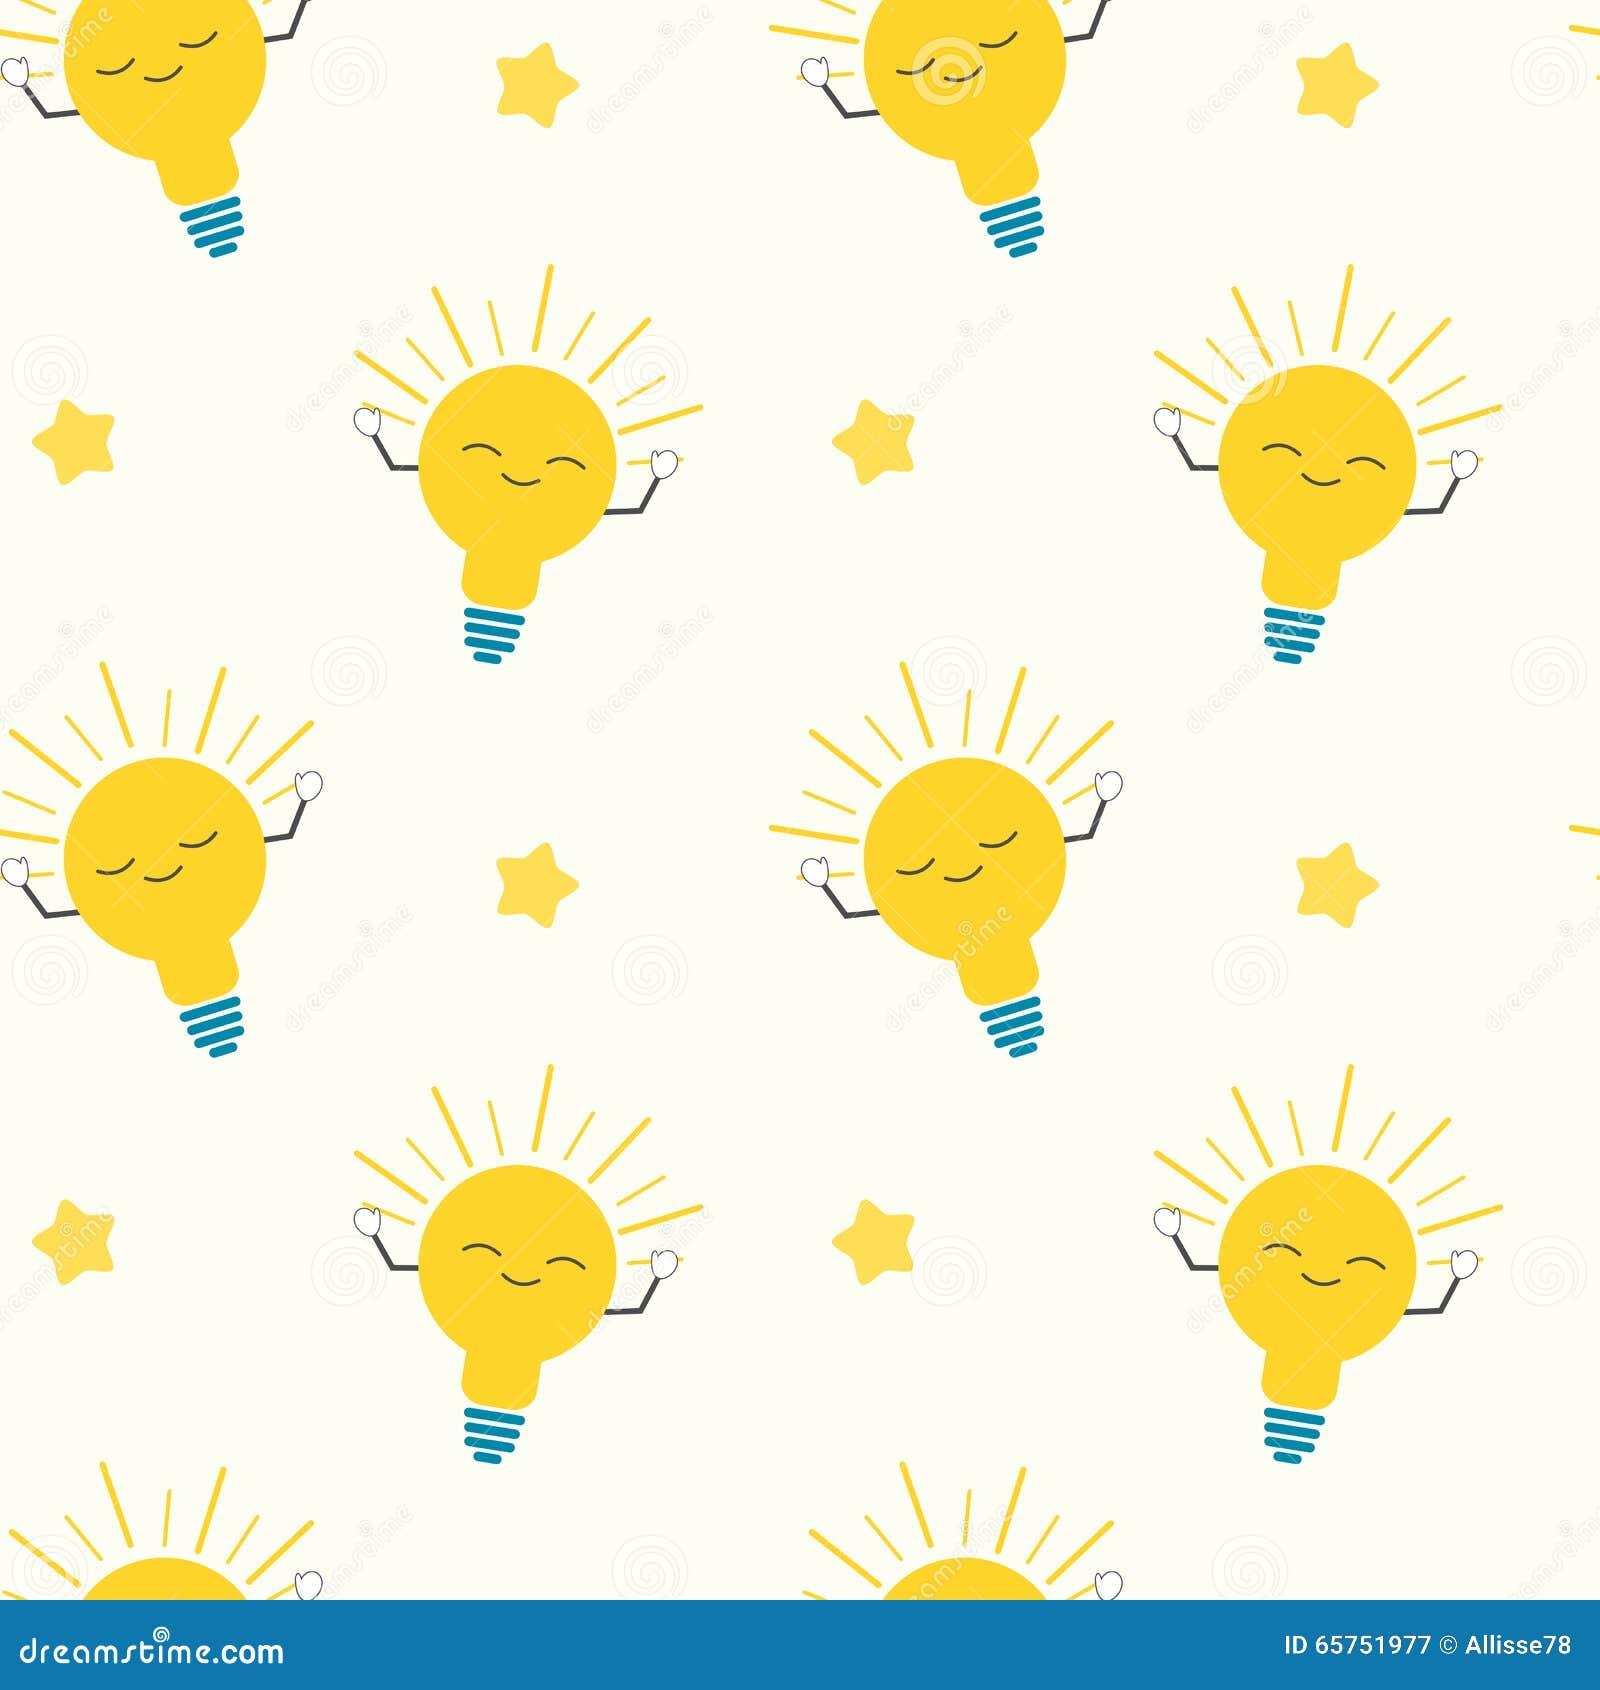 cute cartoon bright yellow light bulbs seamless pattern concept